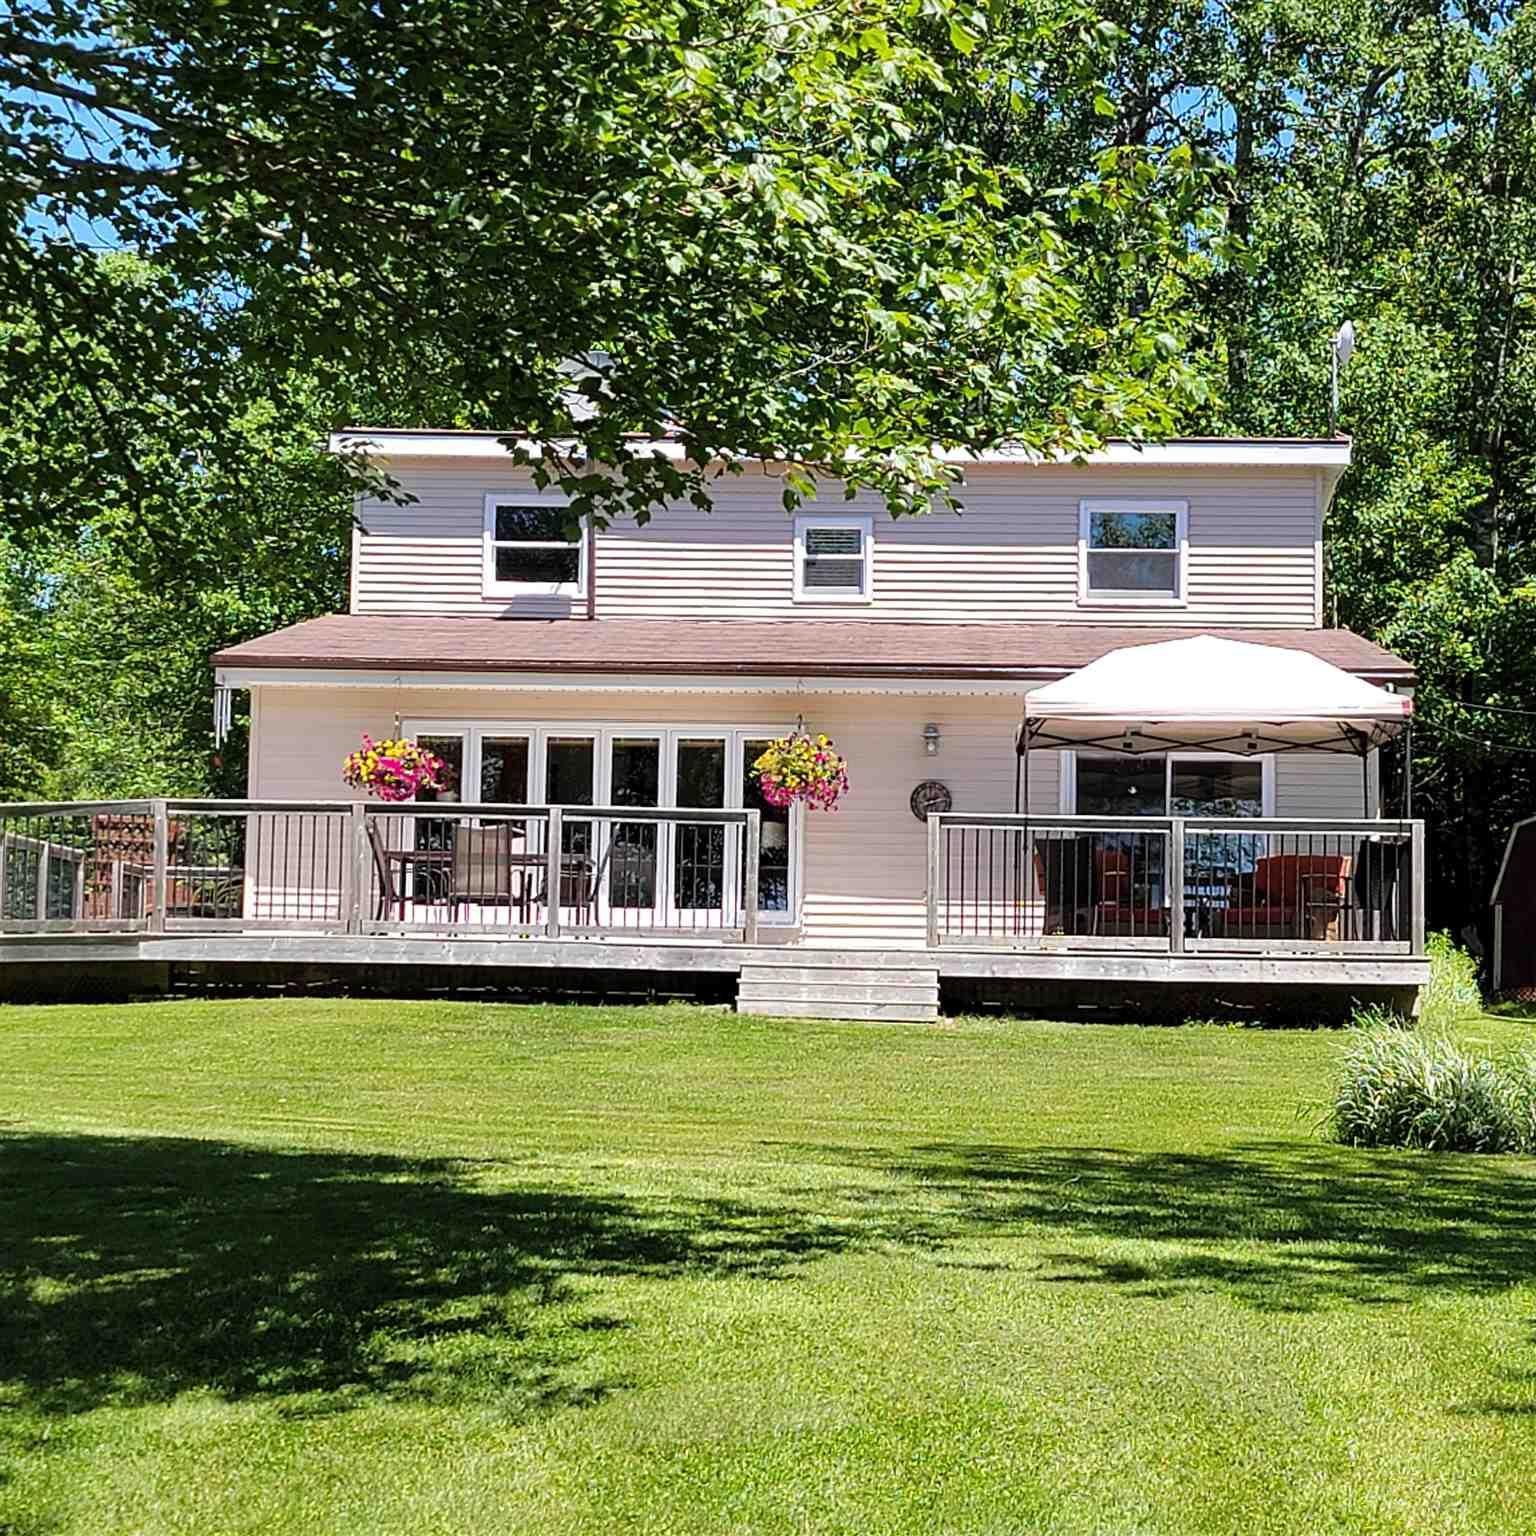 Main Photo: 308 McGrath Avenue in Upper Rawdon: 26-Beaverbank, Upper Sackville Residential for sale (Halifax-Dartmouth)  : MLS®# 202117922